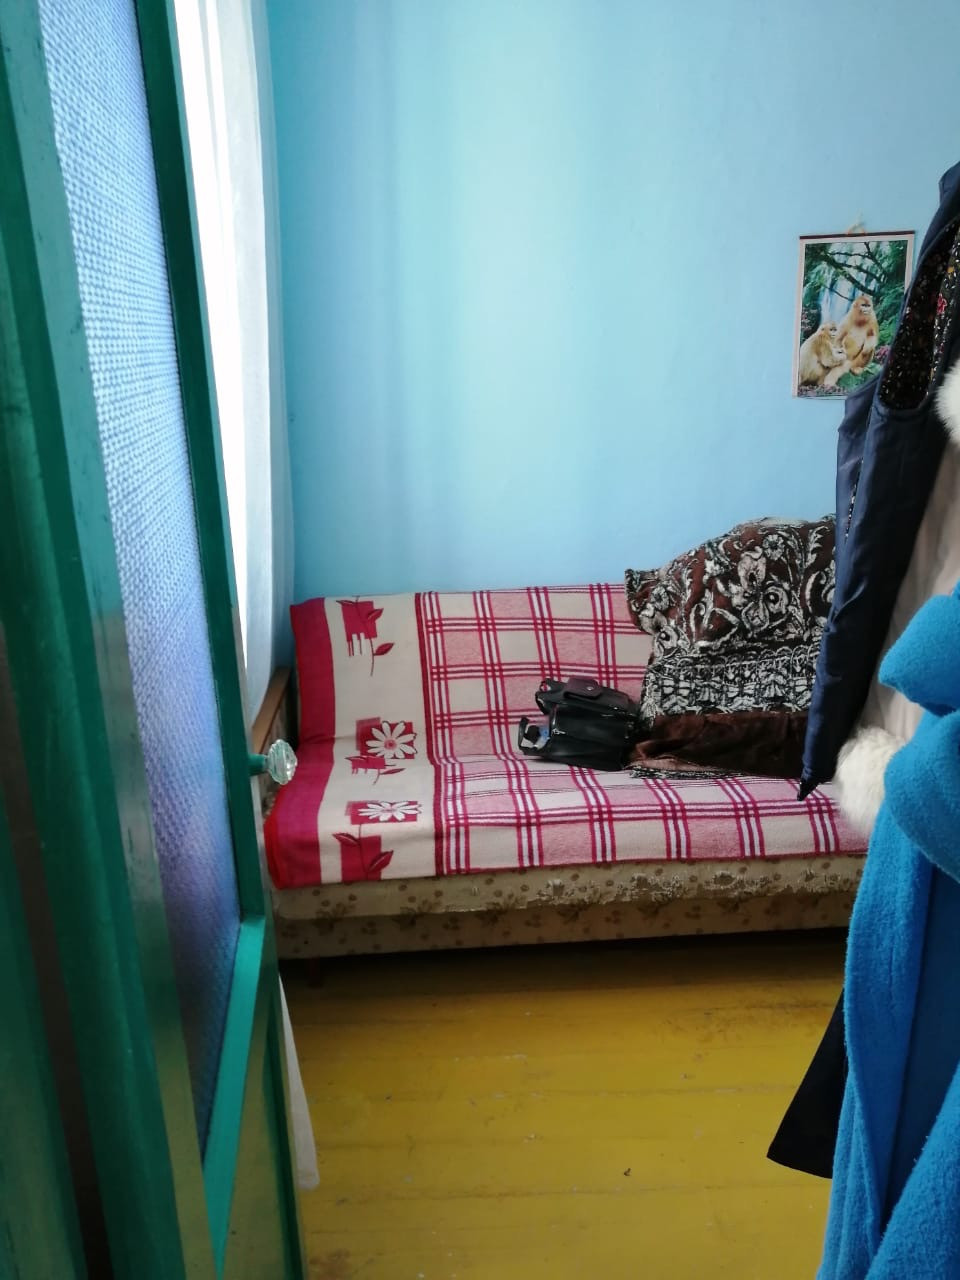 теме письма загс славянка хасанский район фото постановление разрешающее